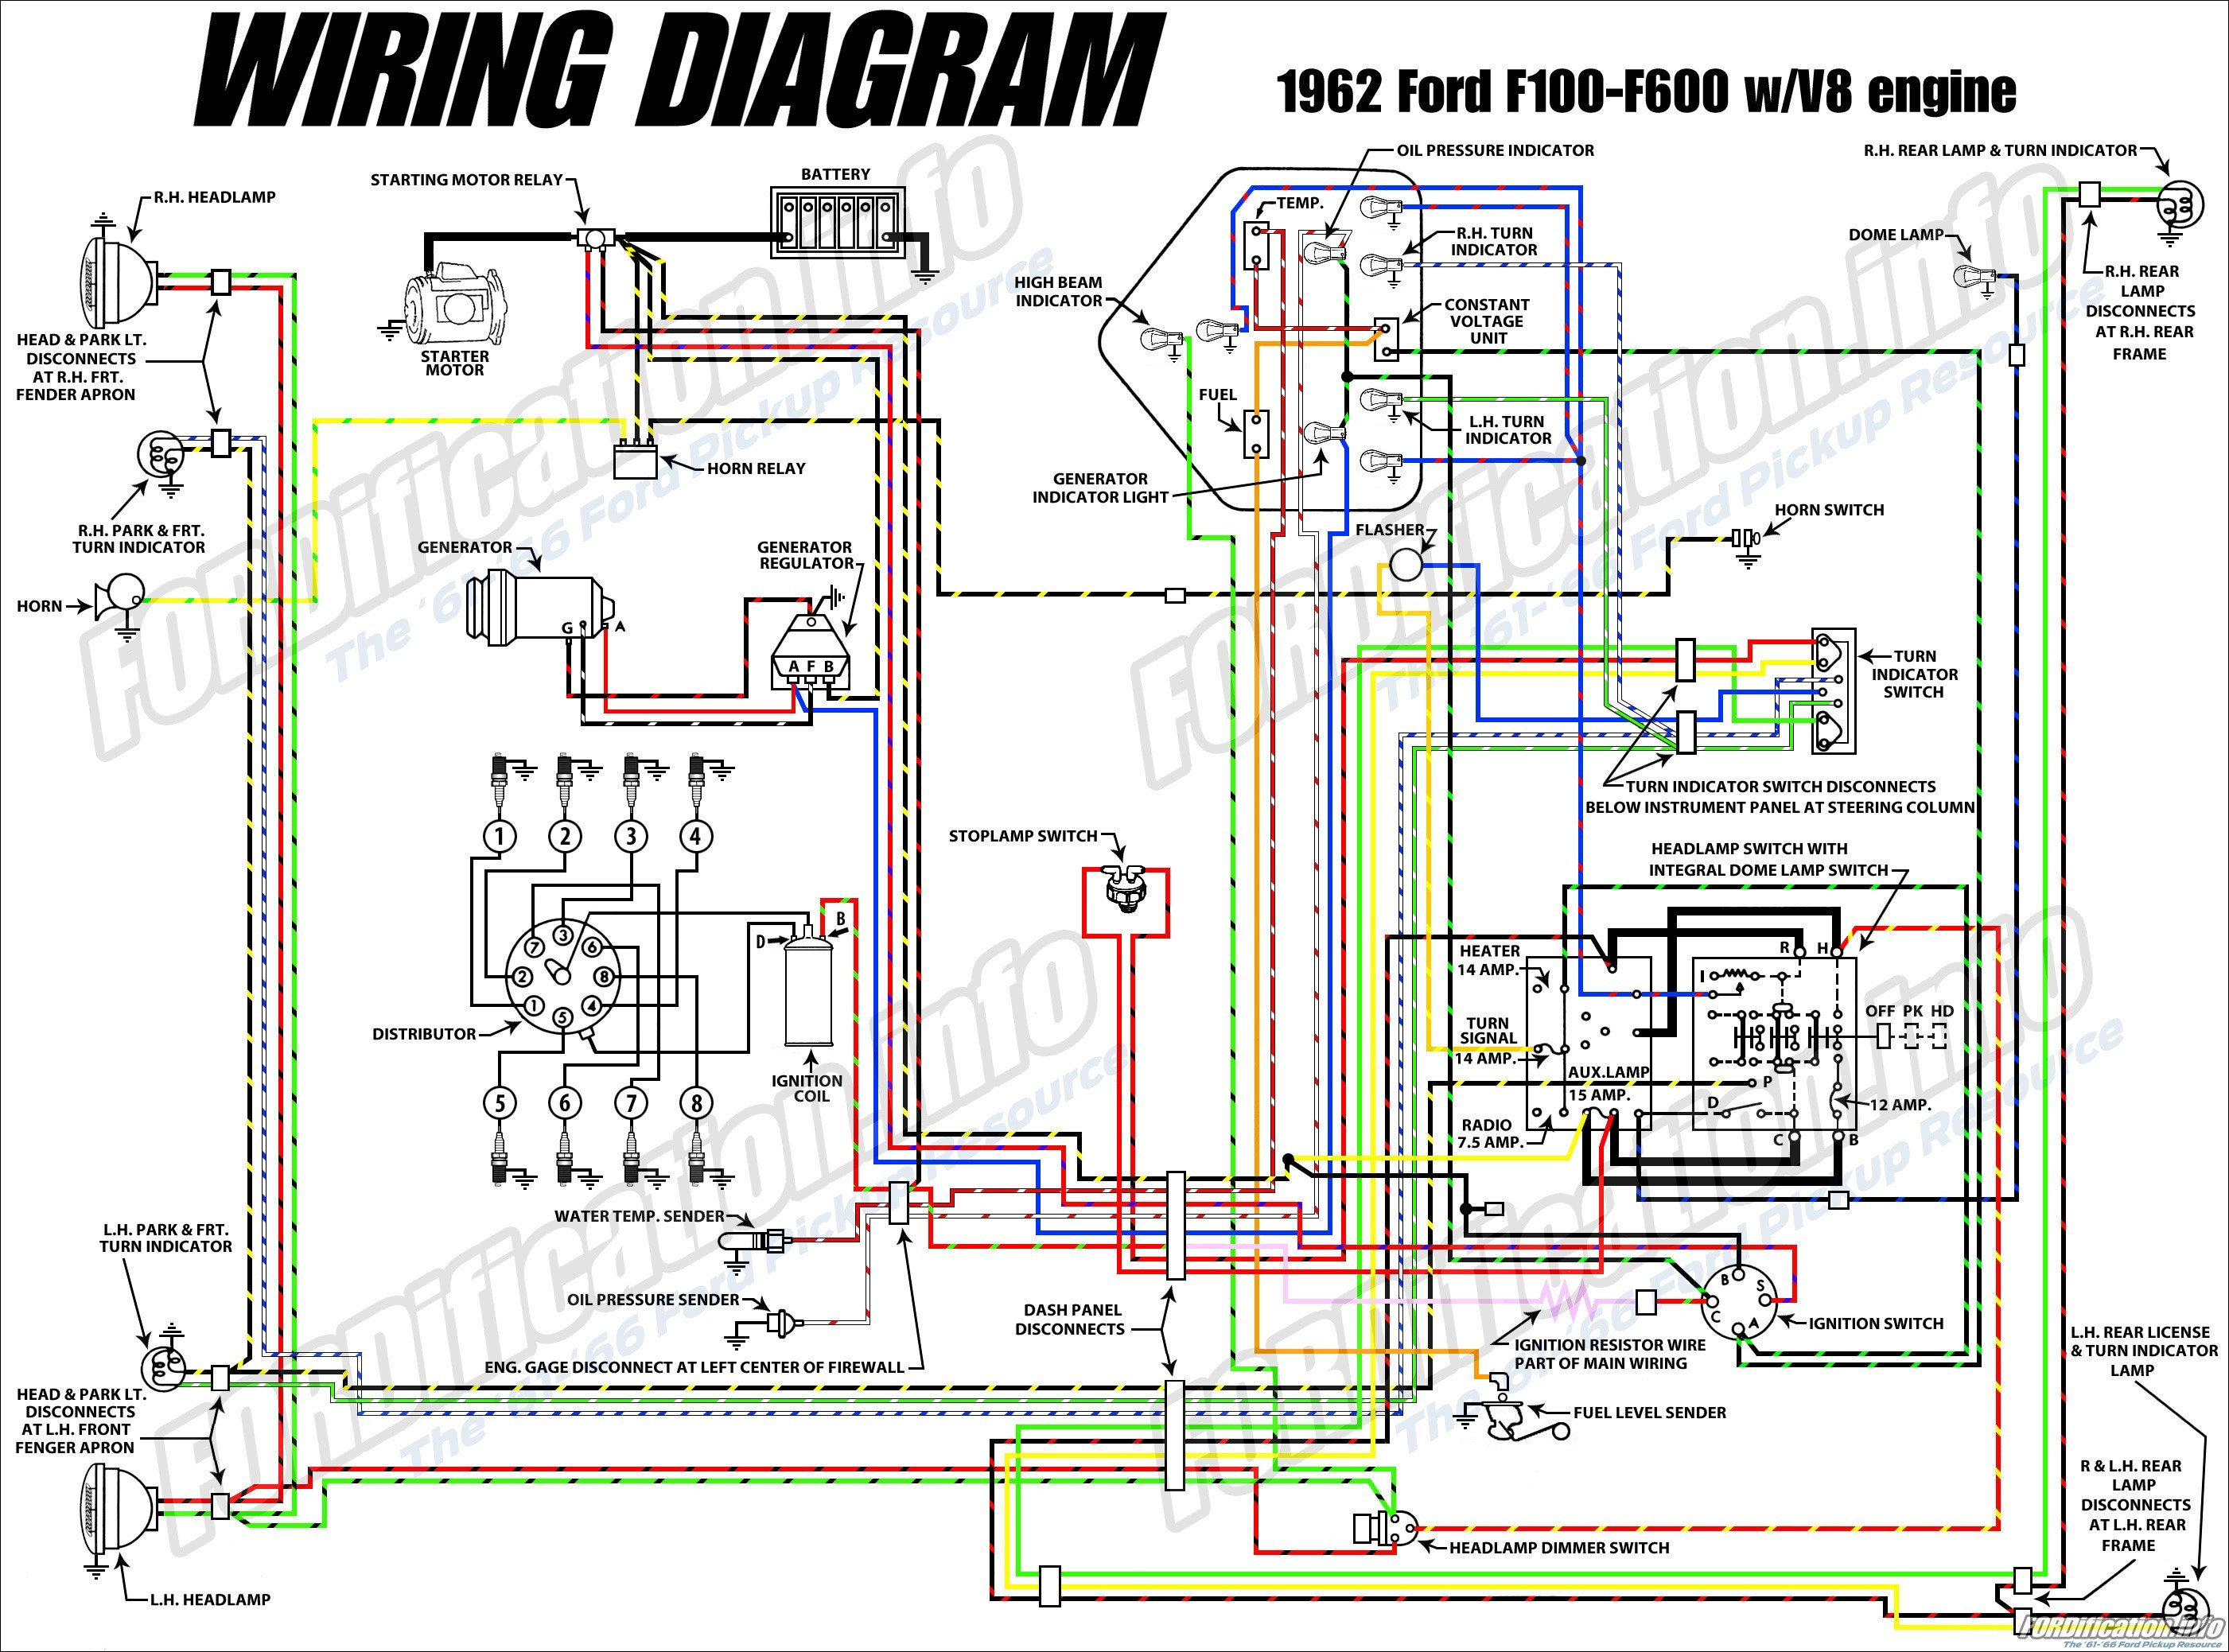 Speed Tech Lights Wiring Diagram | Manual E-Books - Speed Tech Lights Wiring Diagram